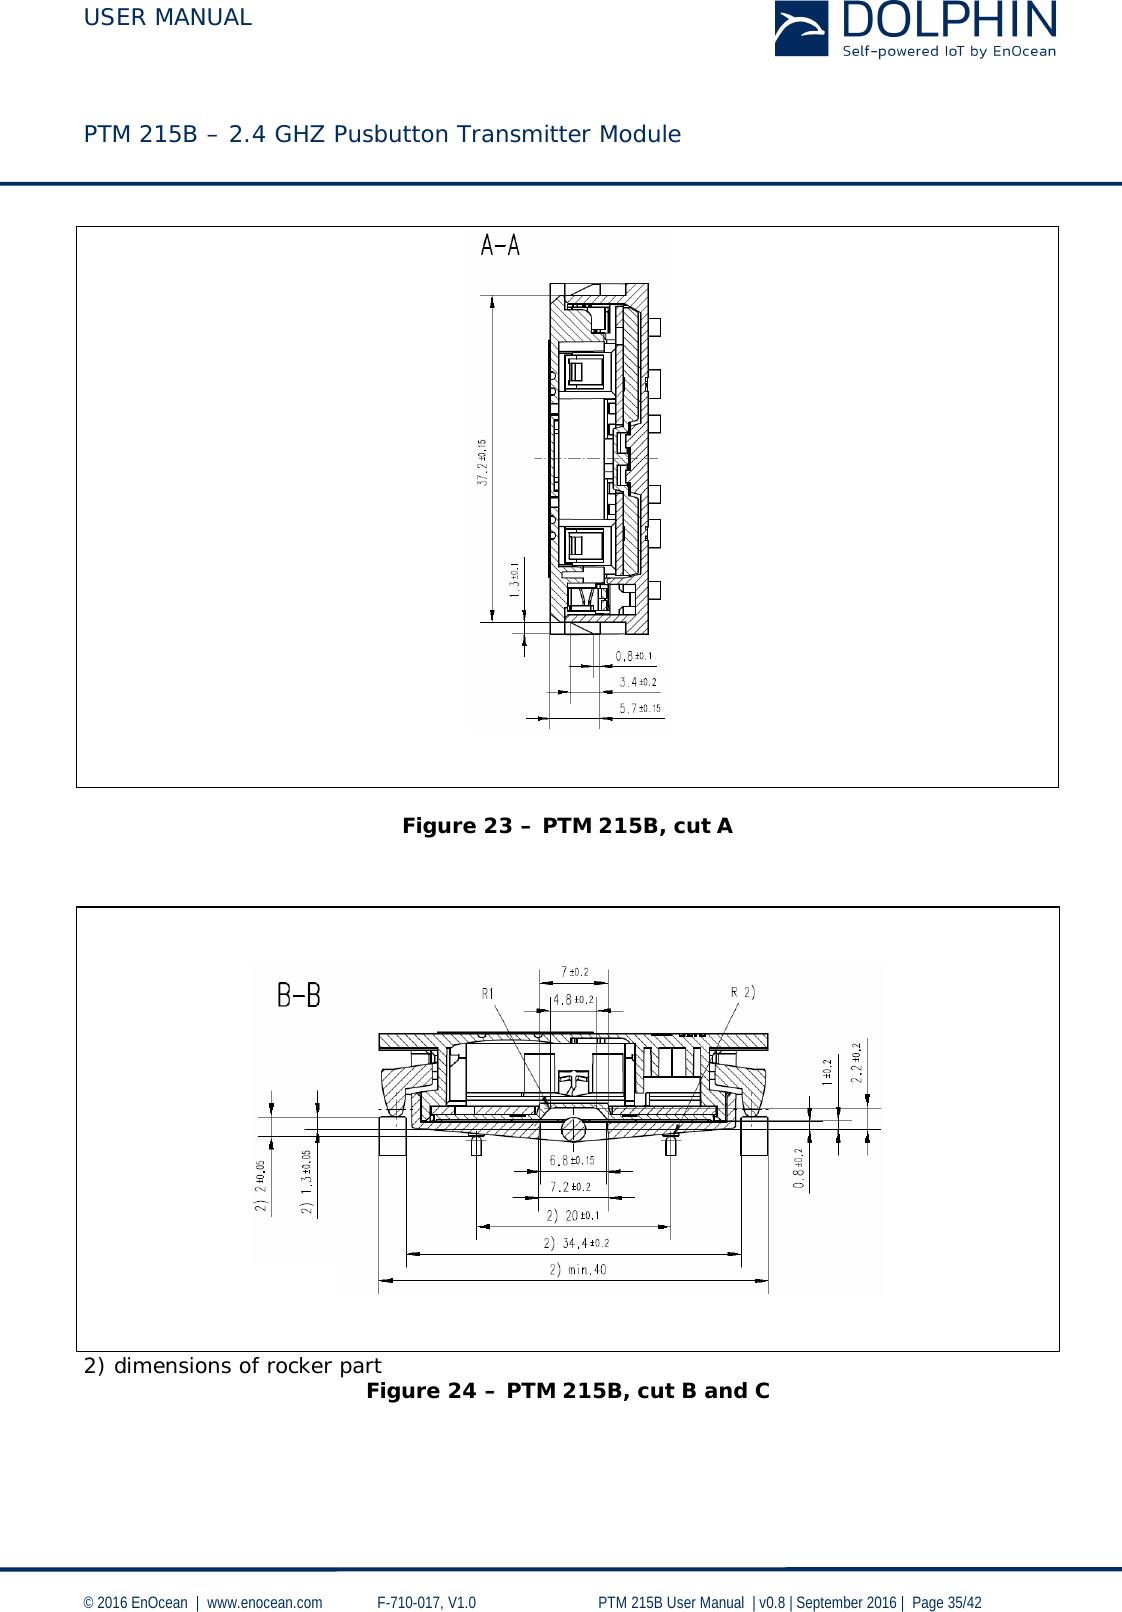 USER MANUAL    PTM 215B – 2.4 GHZ Pusbutton Transmitter Module  © 2016 EnOcean     www.enocean.com   F-710-017, V1.0        PTM 215B User Manual    v0.8   September 2016    Page 35/42     Figure 23 – PTM 215B, cut A        2) dimensions of rocker part Figure 24 – PTM 215B, cut B and C